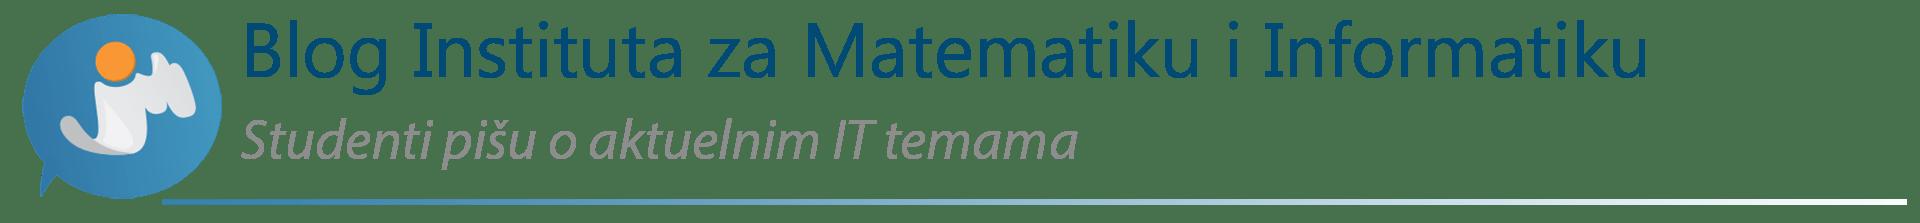 Blog Instituta za Matematiku i Informatiku